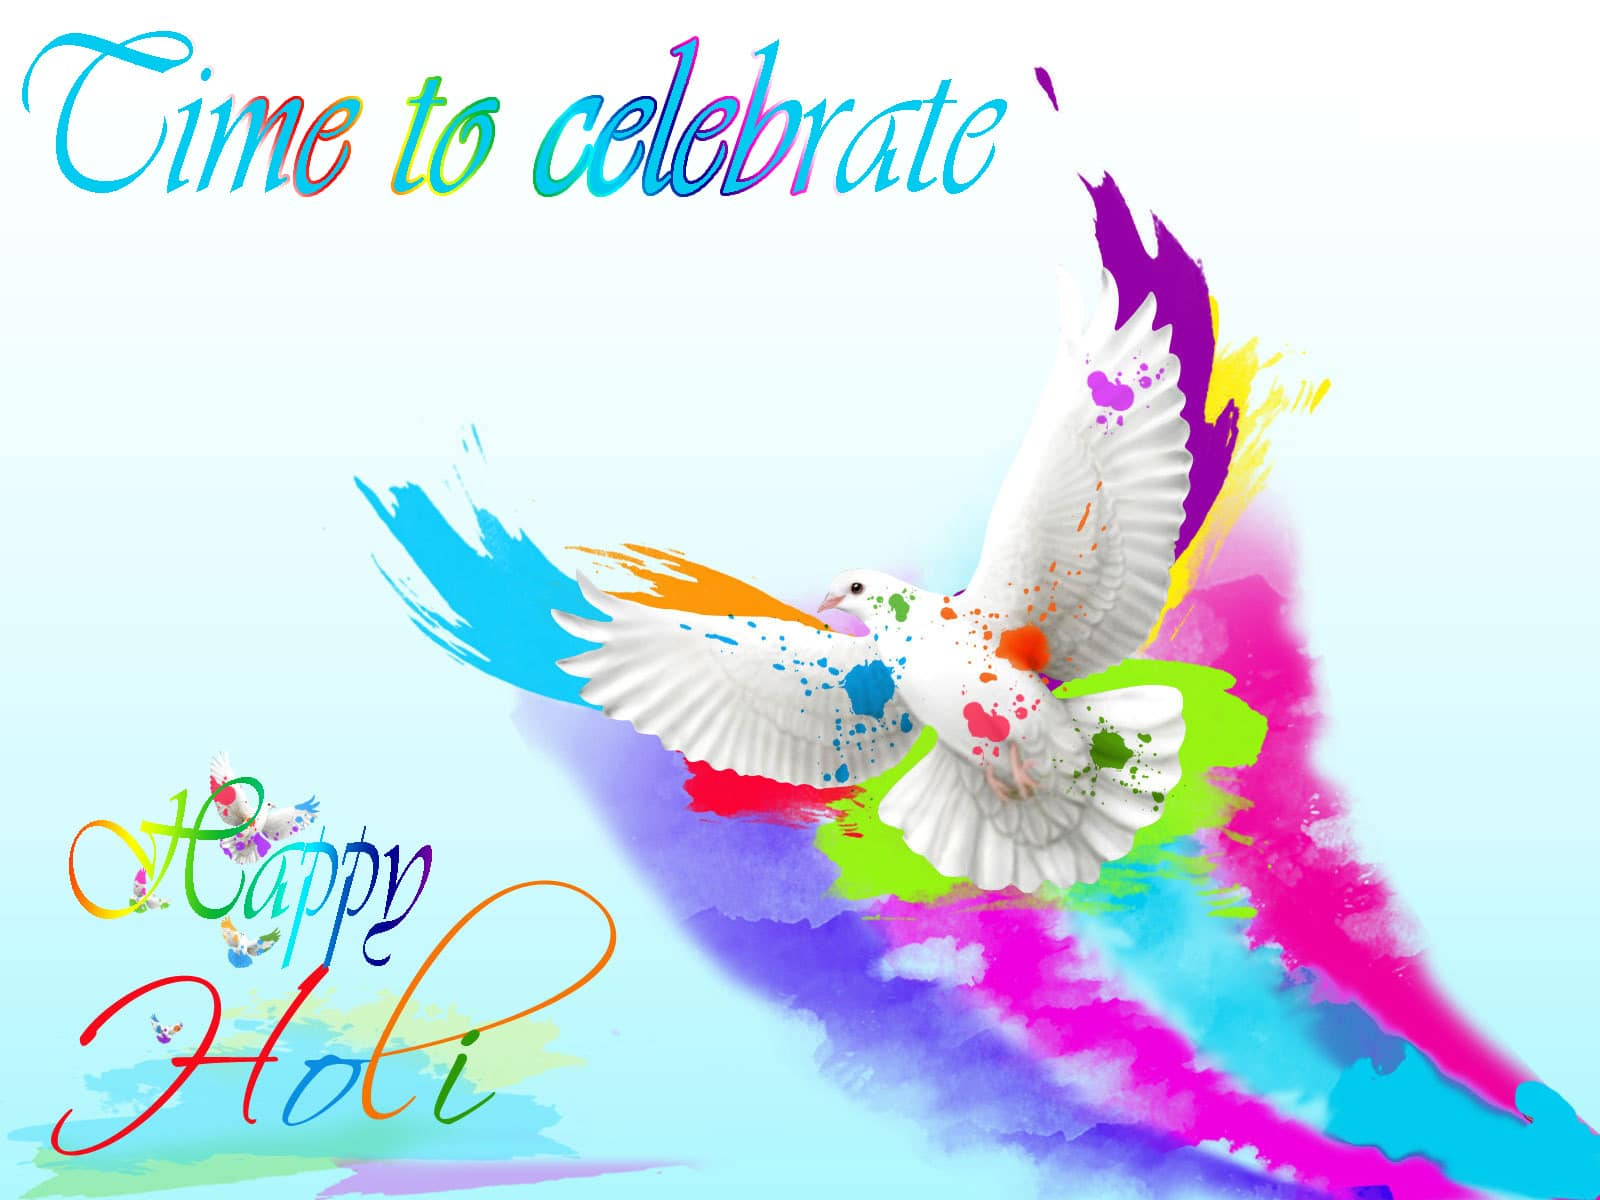 Happy Holi Festival Images 2018